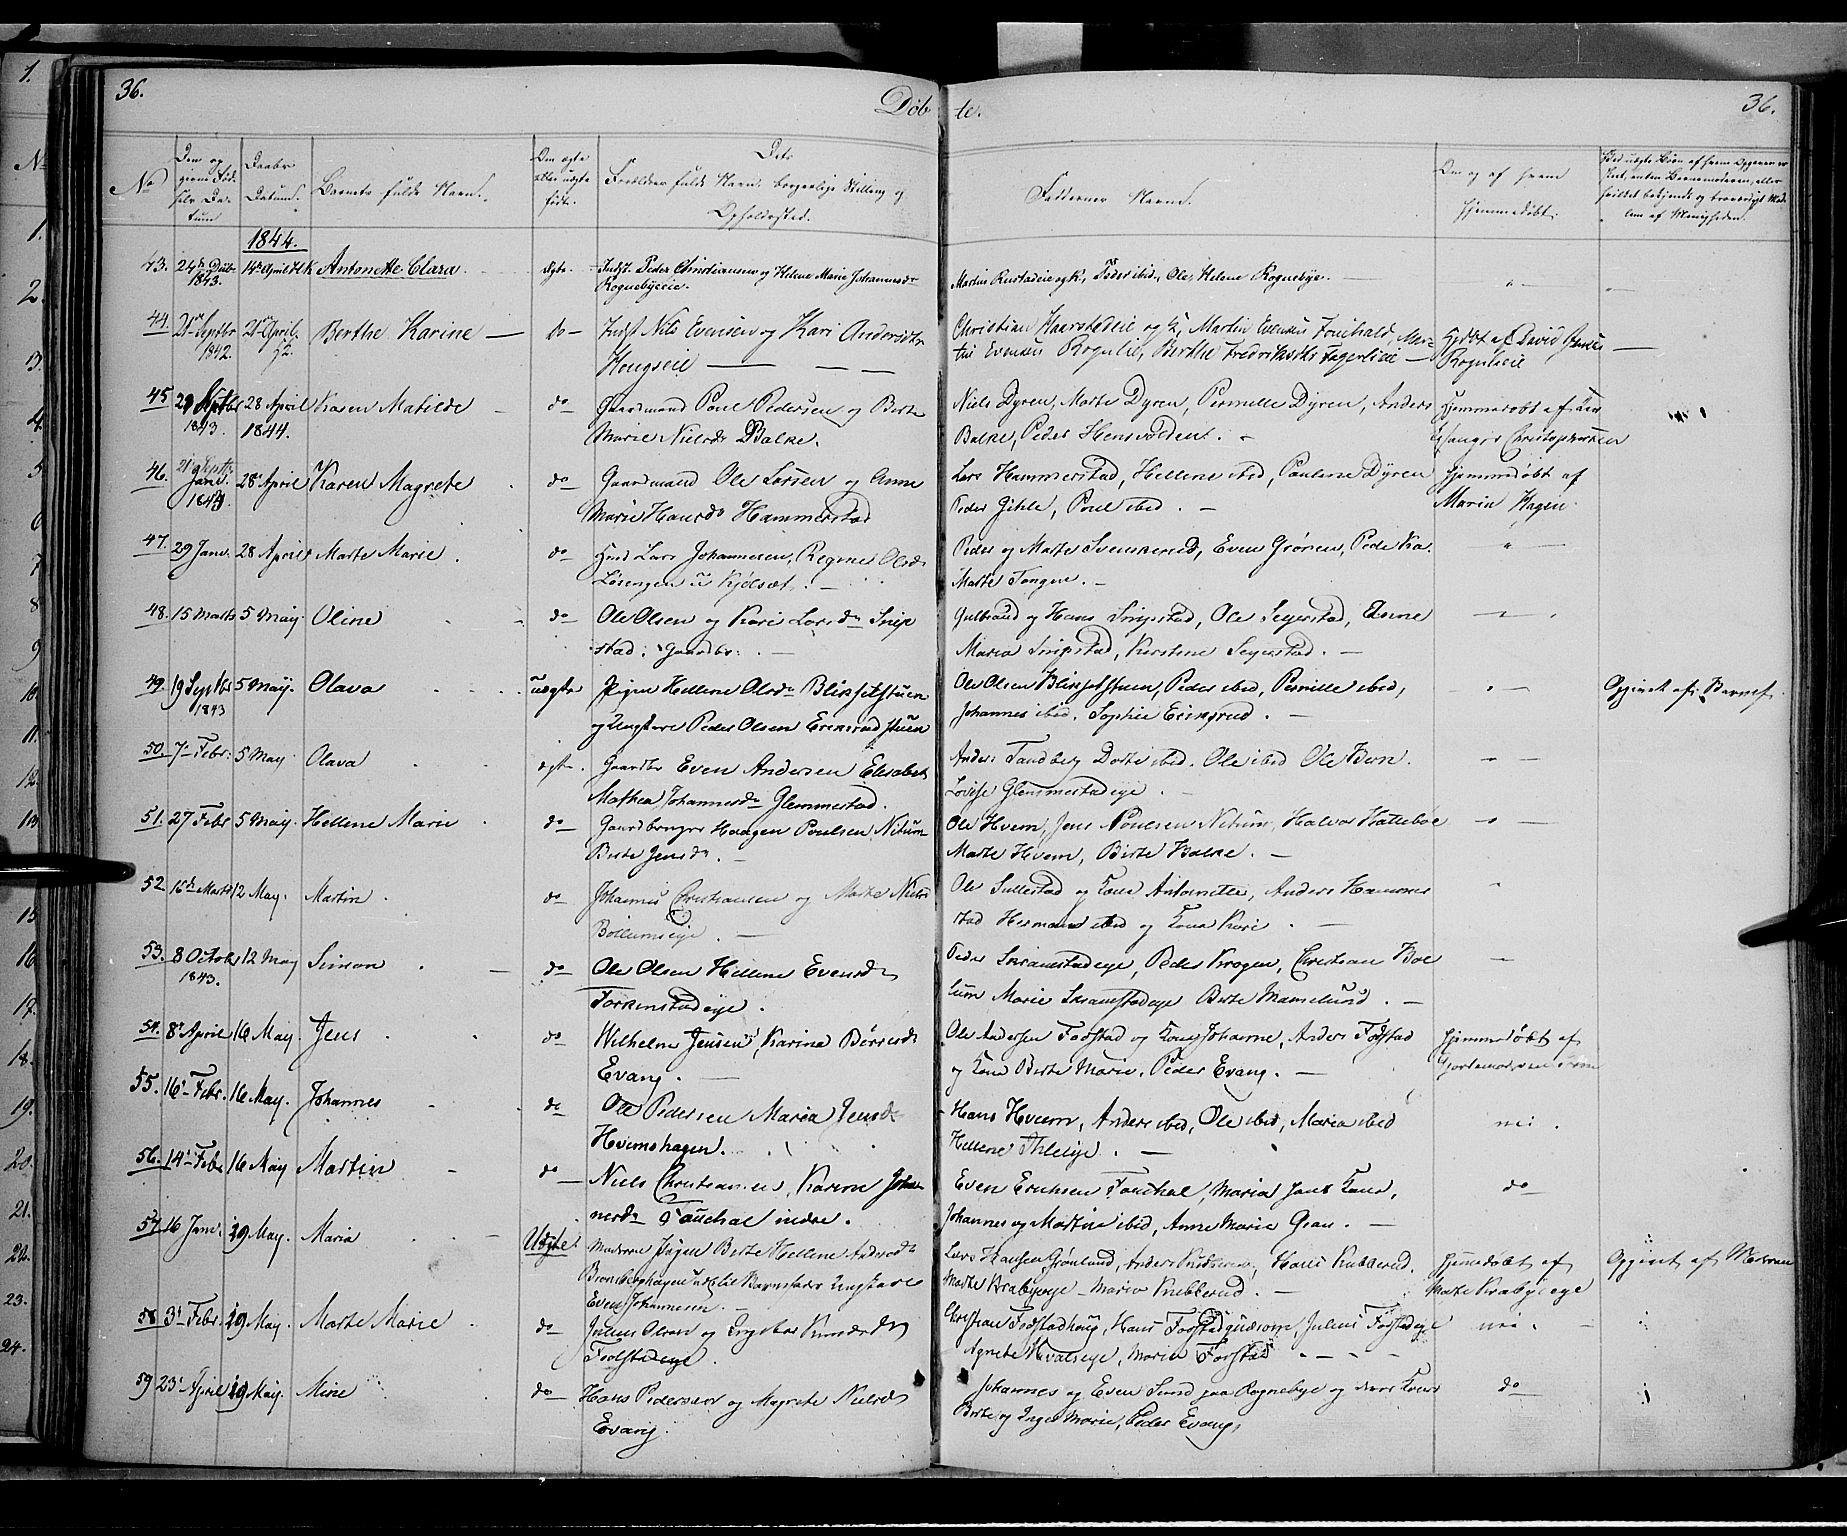 SAH, Østre Toten prestekontor, Ministerialbok nr. 2, 1840-1847, s. 36